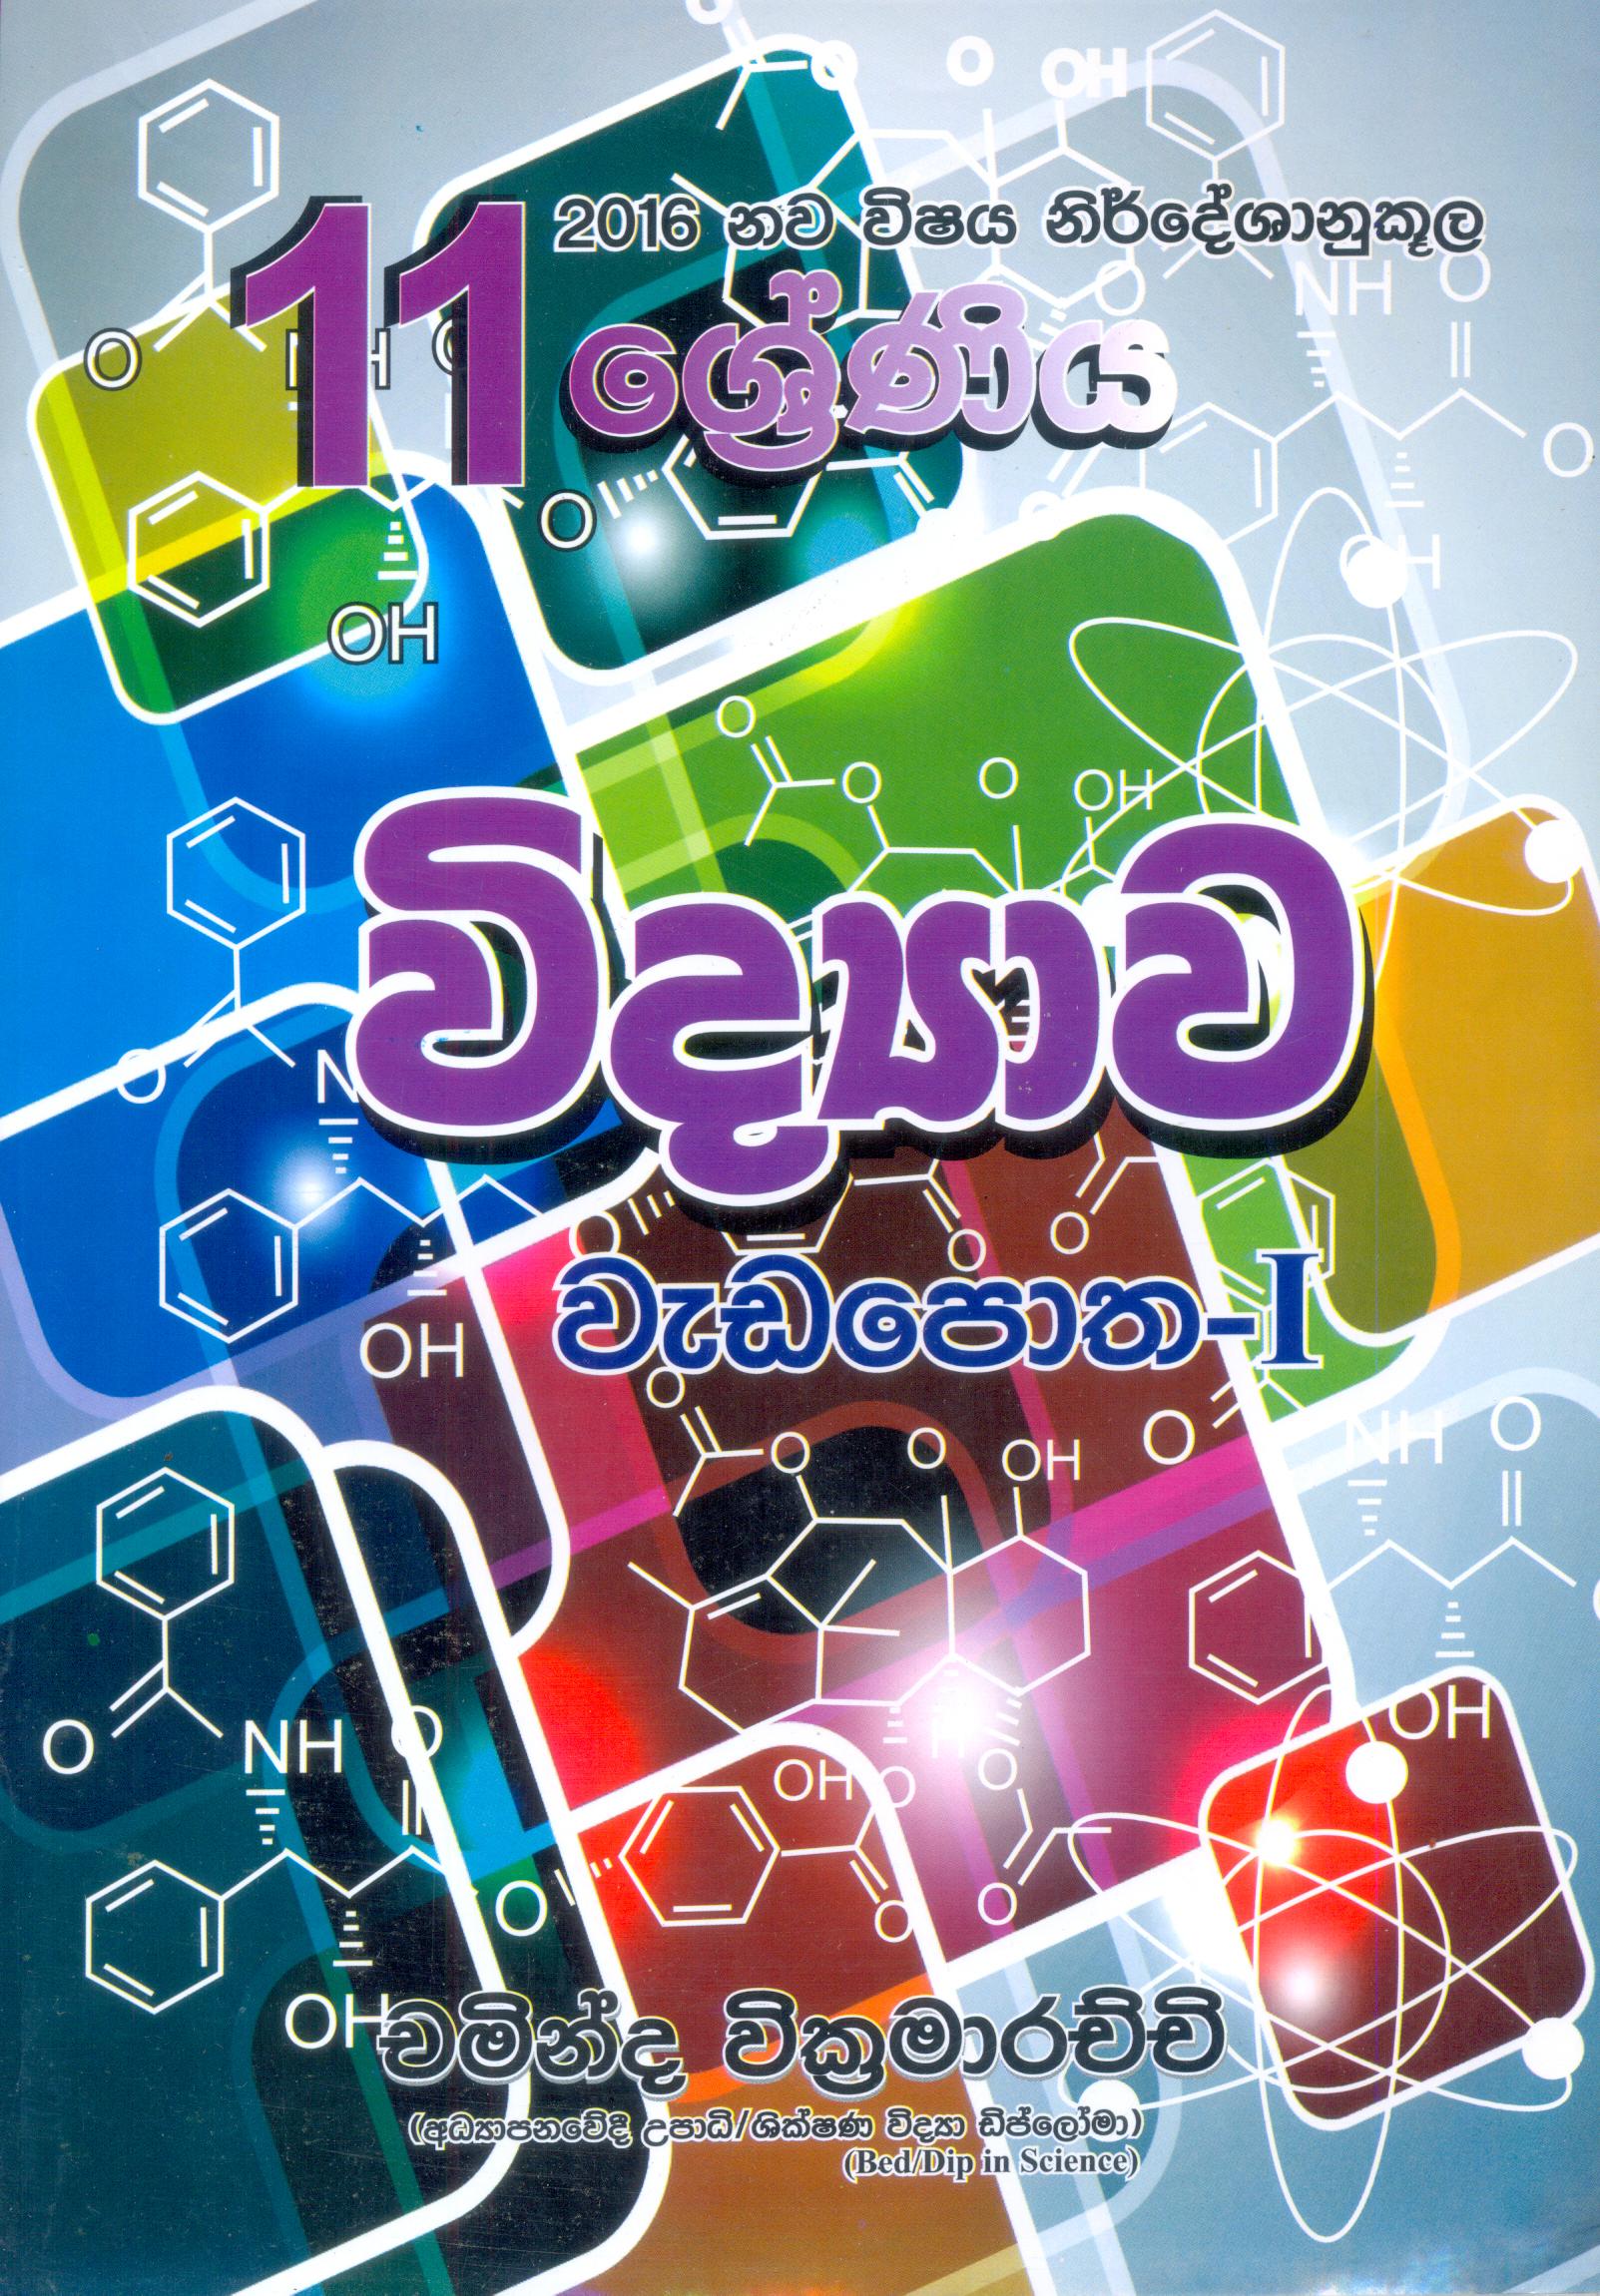 2016 Nawa Vishaya Nirdeshanukoola 11 Shreniya Vidyawa Wadapotha - I